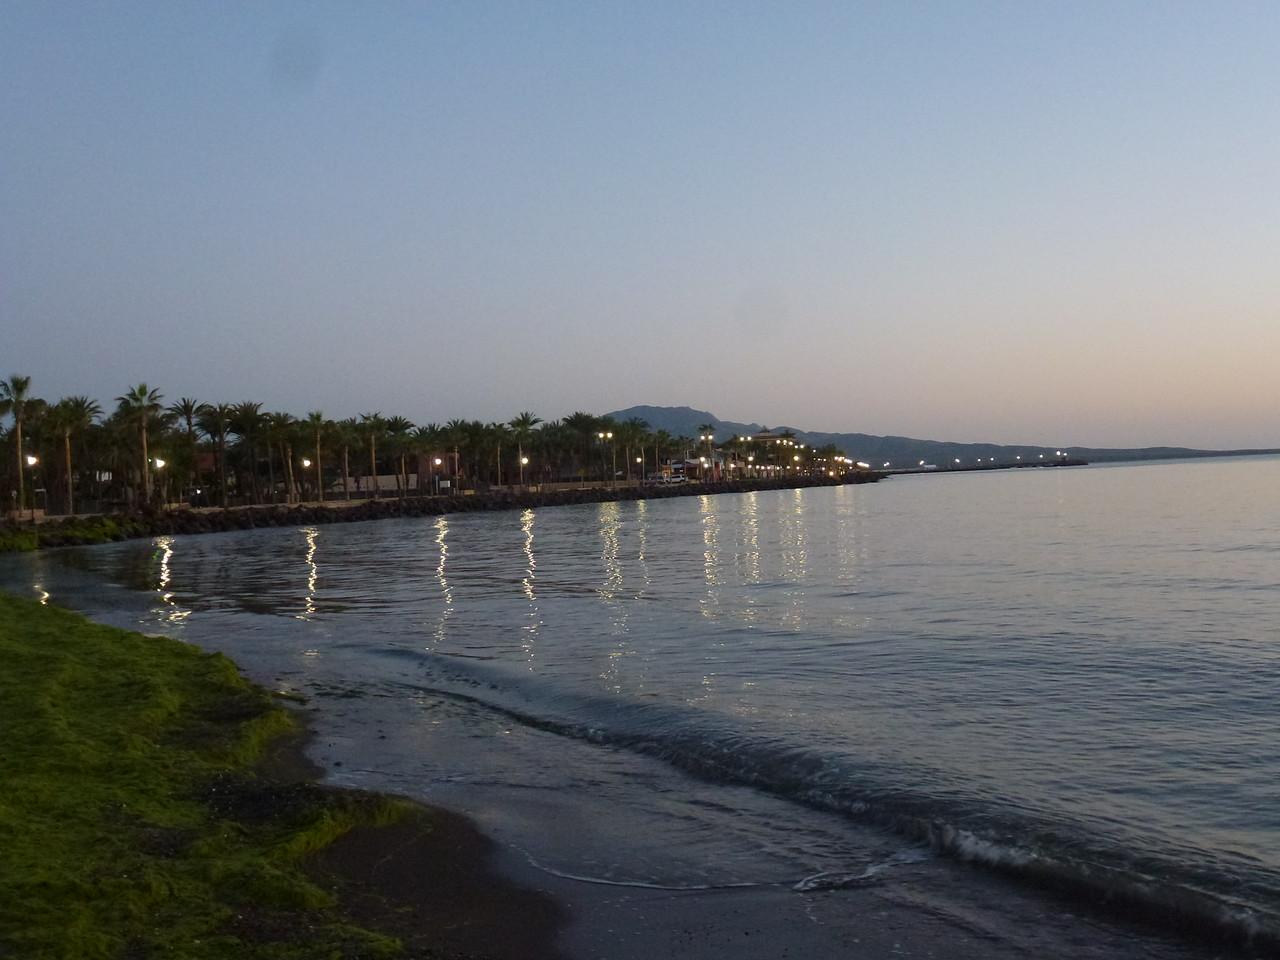 Sunrise in Loreto - about 5:30 am